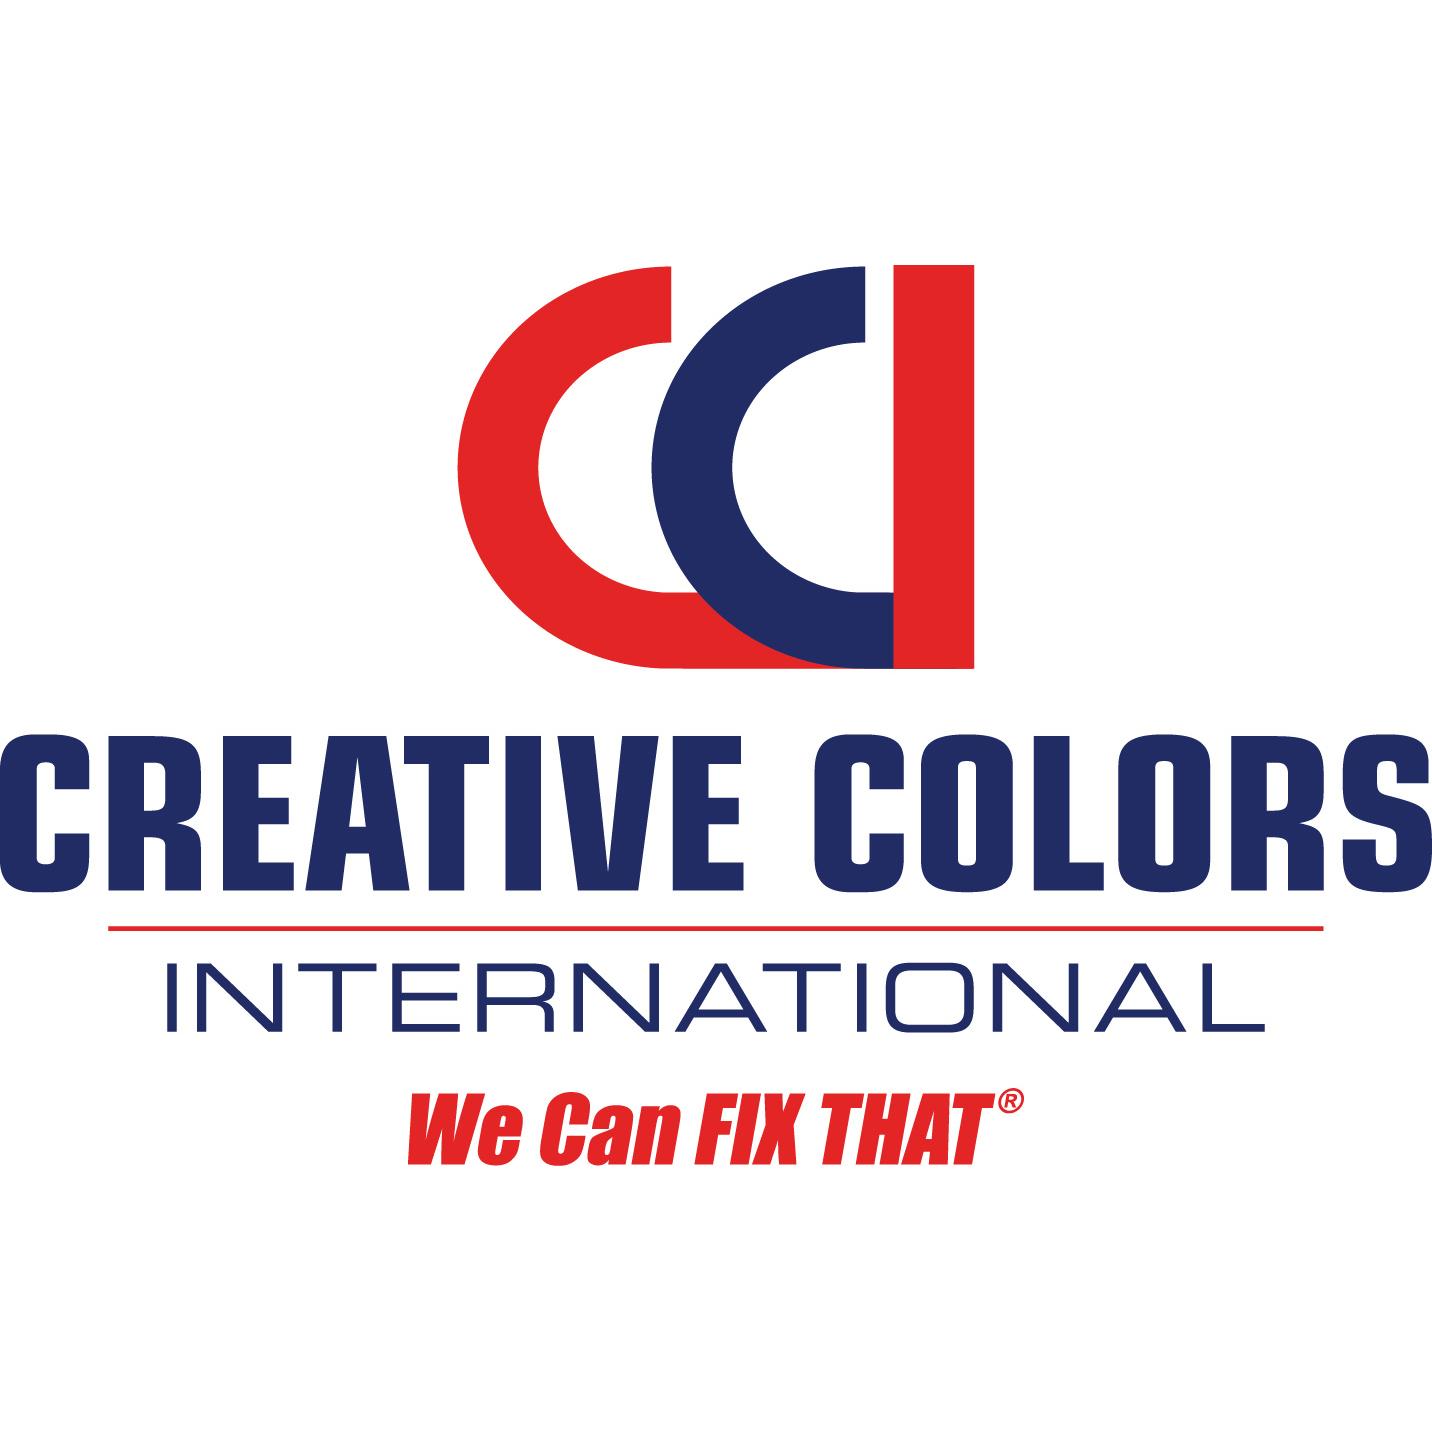 Creative Colors International-We Can Fix That - Pearl River LA